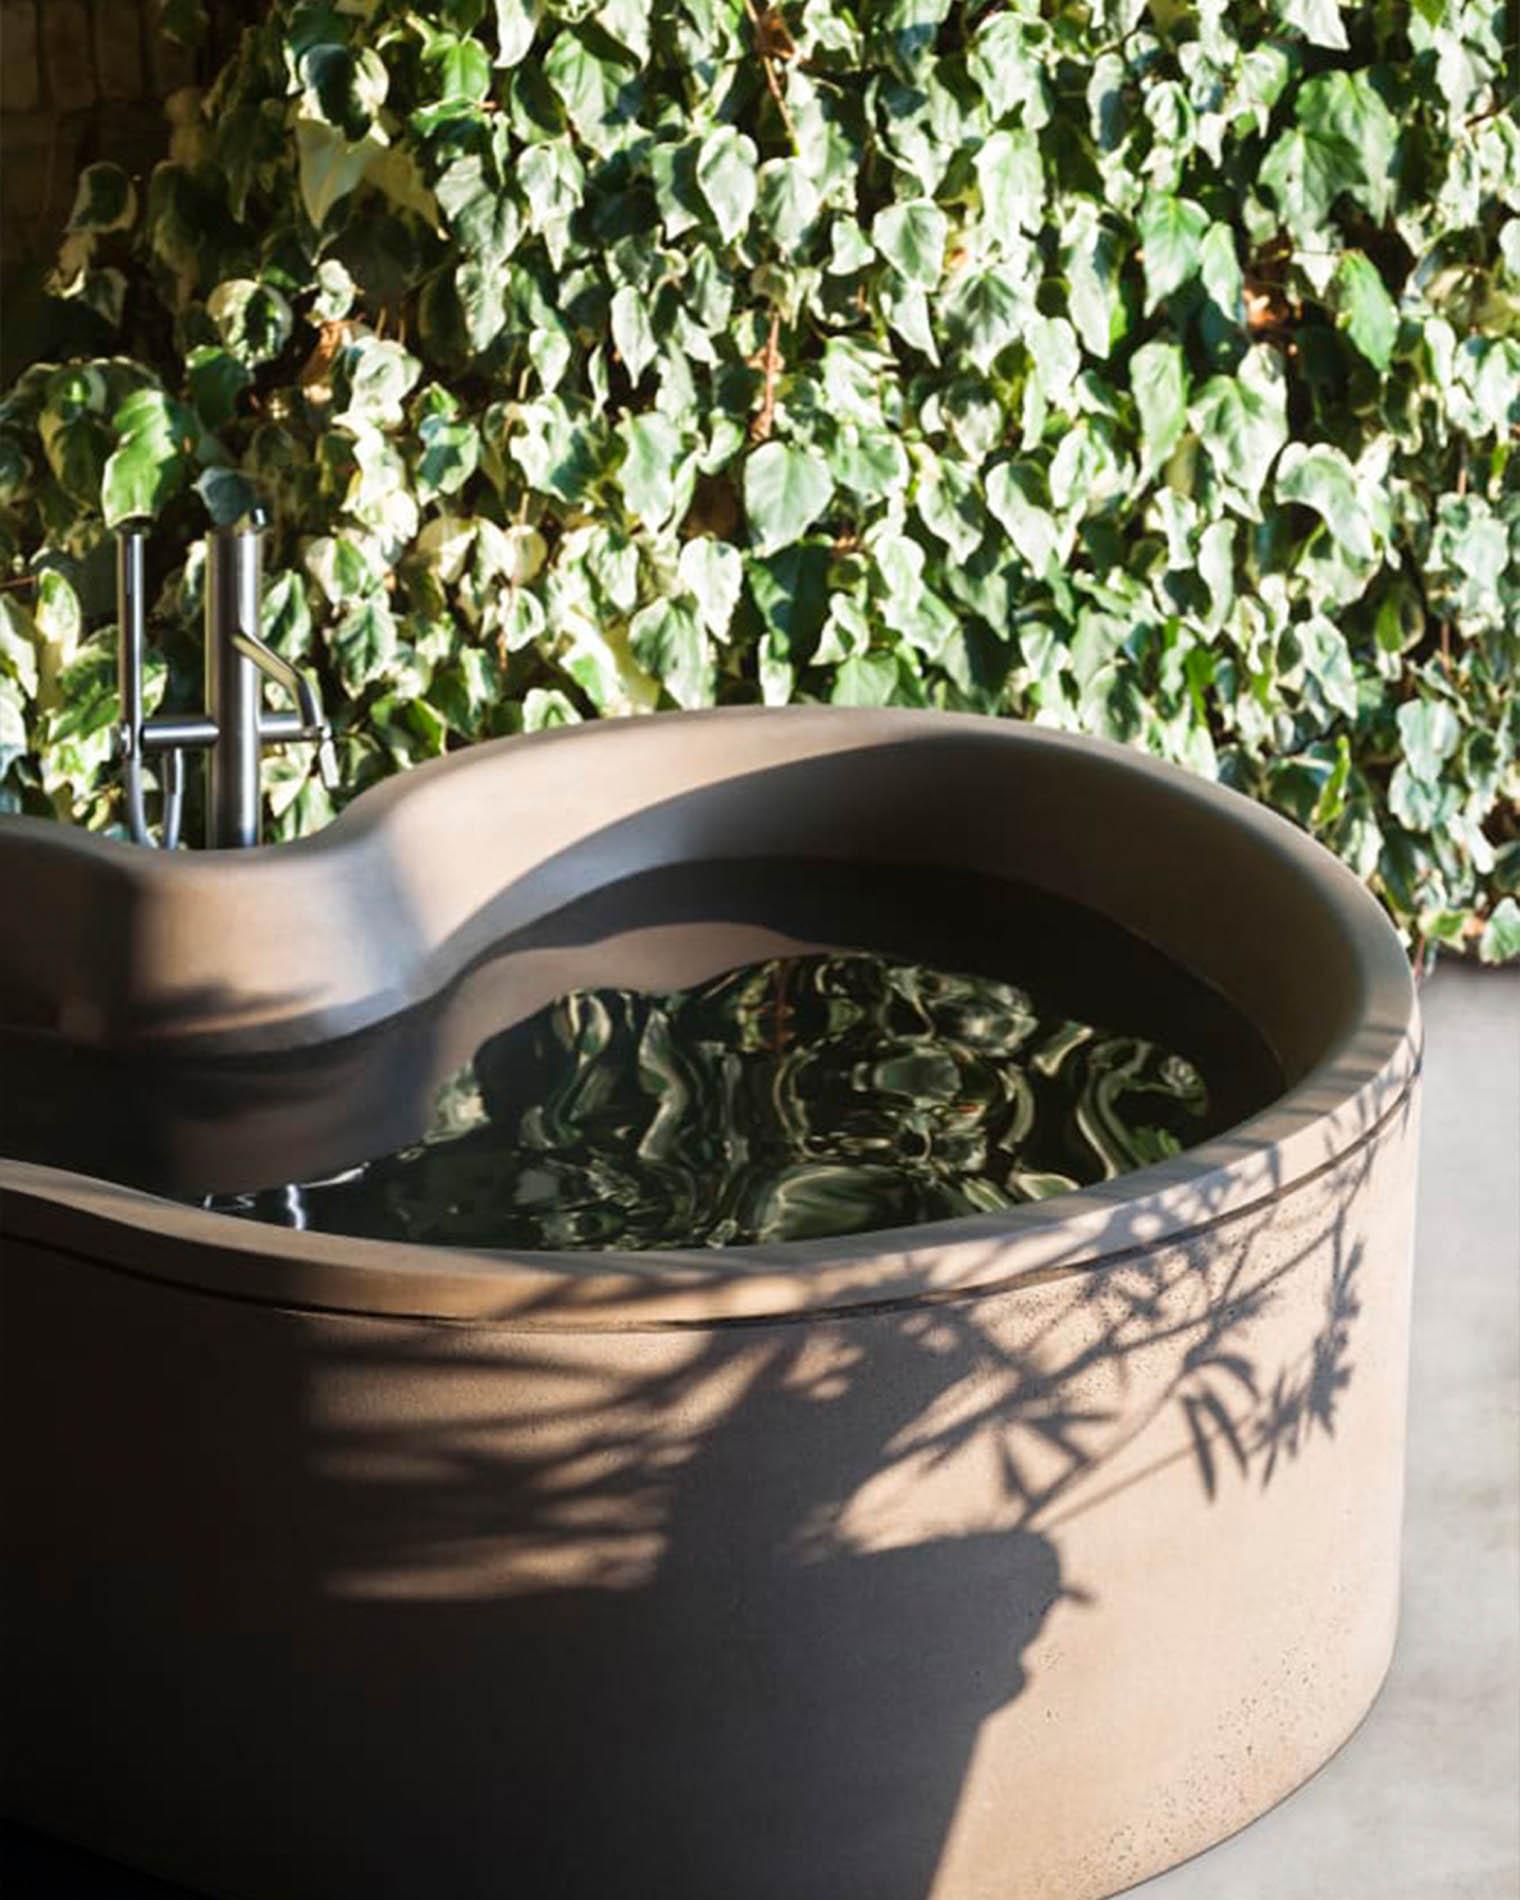 Bañera para jardines o terrazas diseñada por StudioMK27